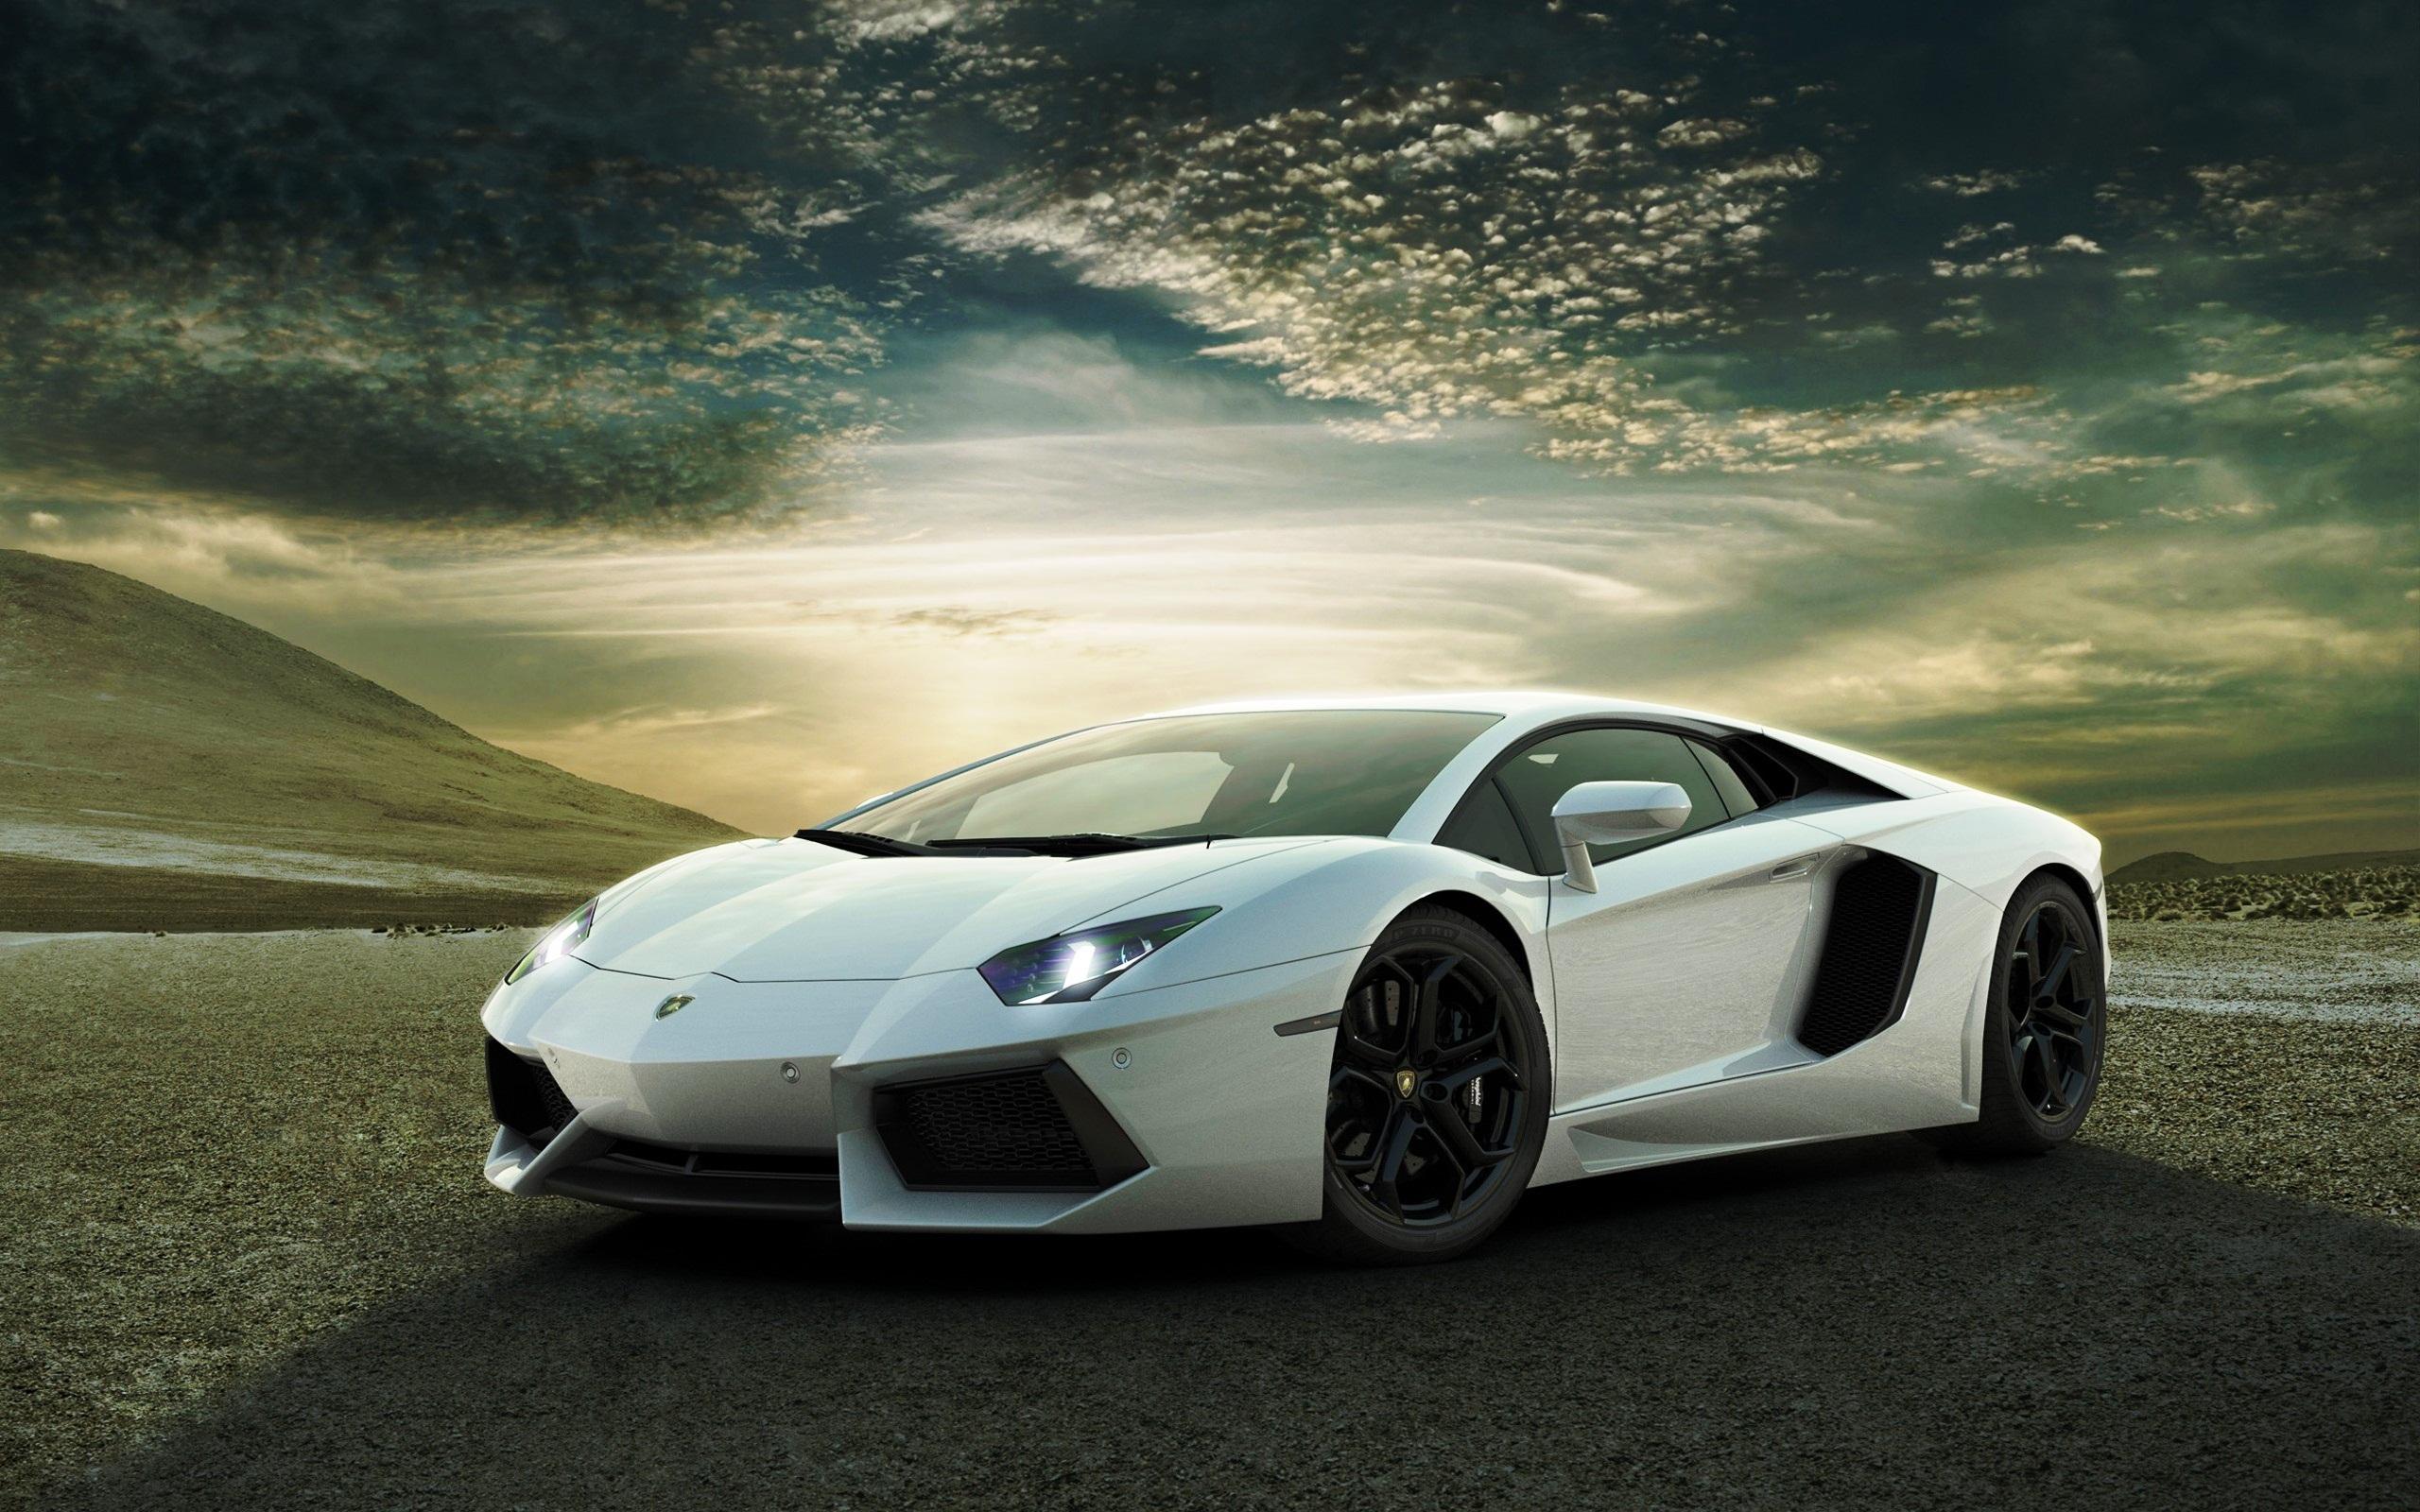 White Lamborghini Aventador Wallpapers HD Wallpapers 2560x1600